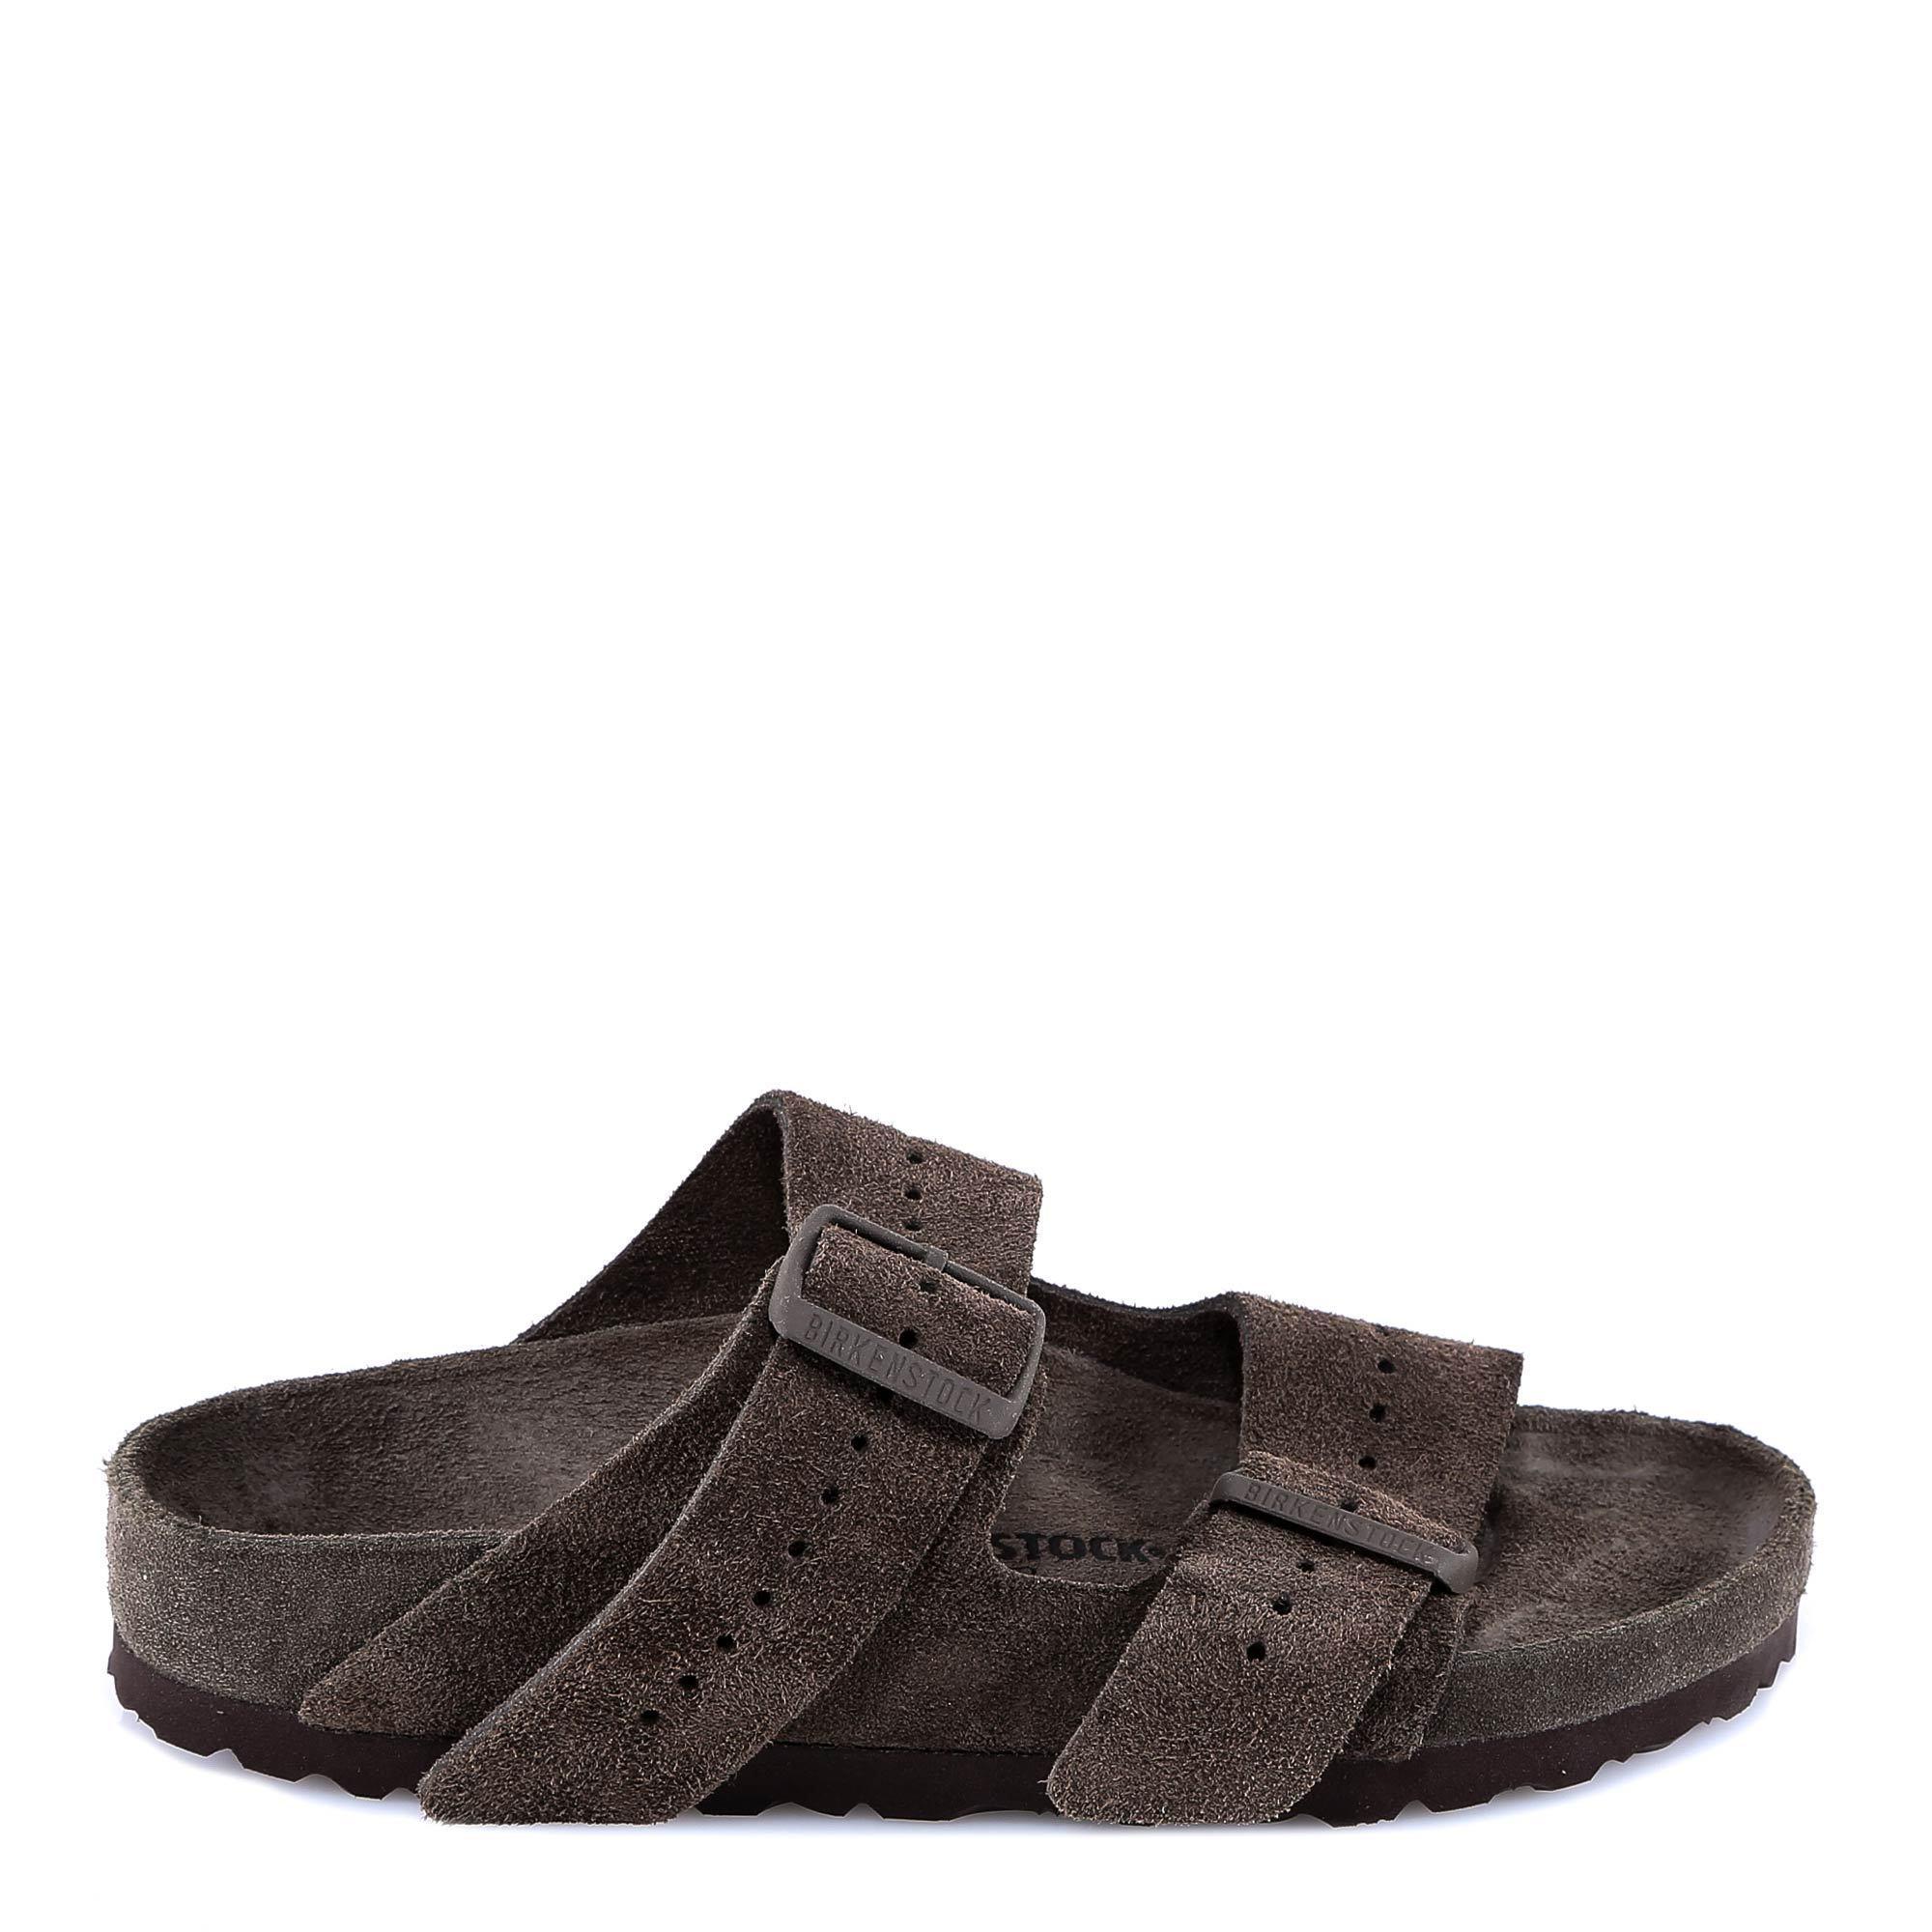 29fede5dd16f Rick Owens X Birkenstock Sandals in Gray - Lyst